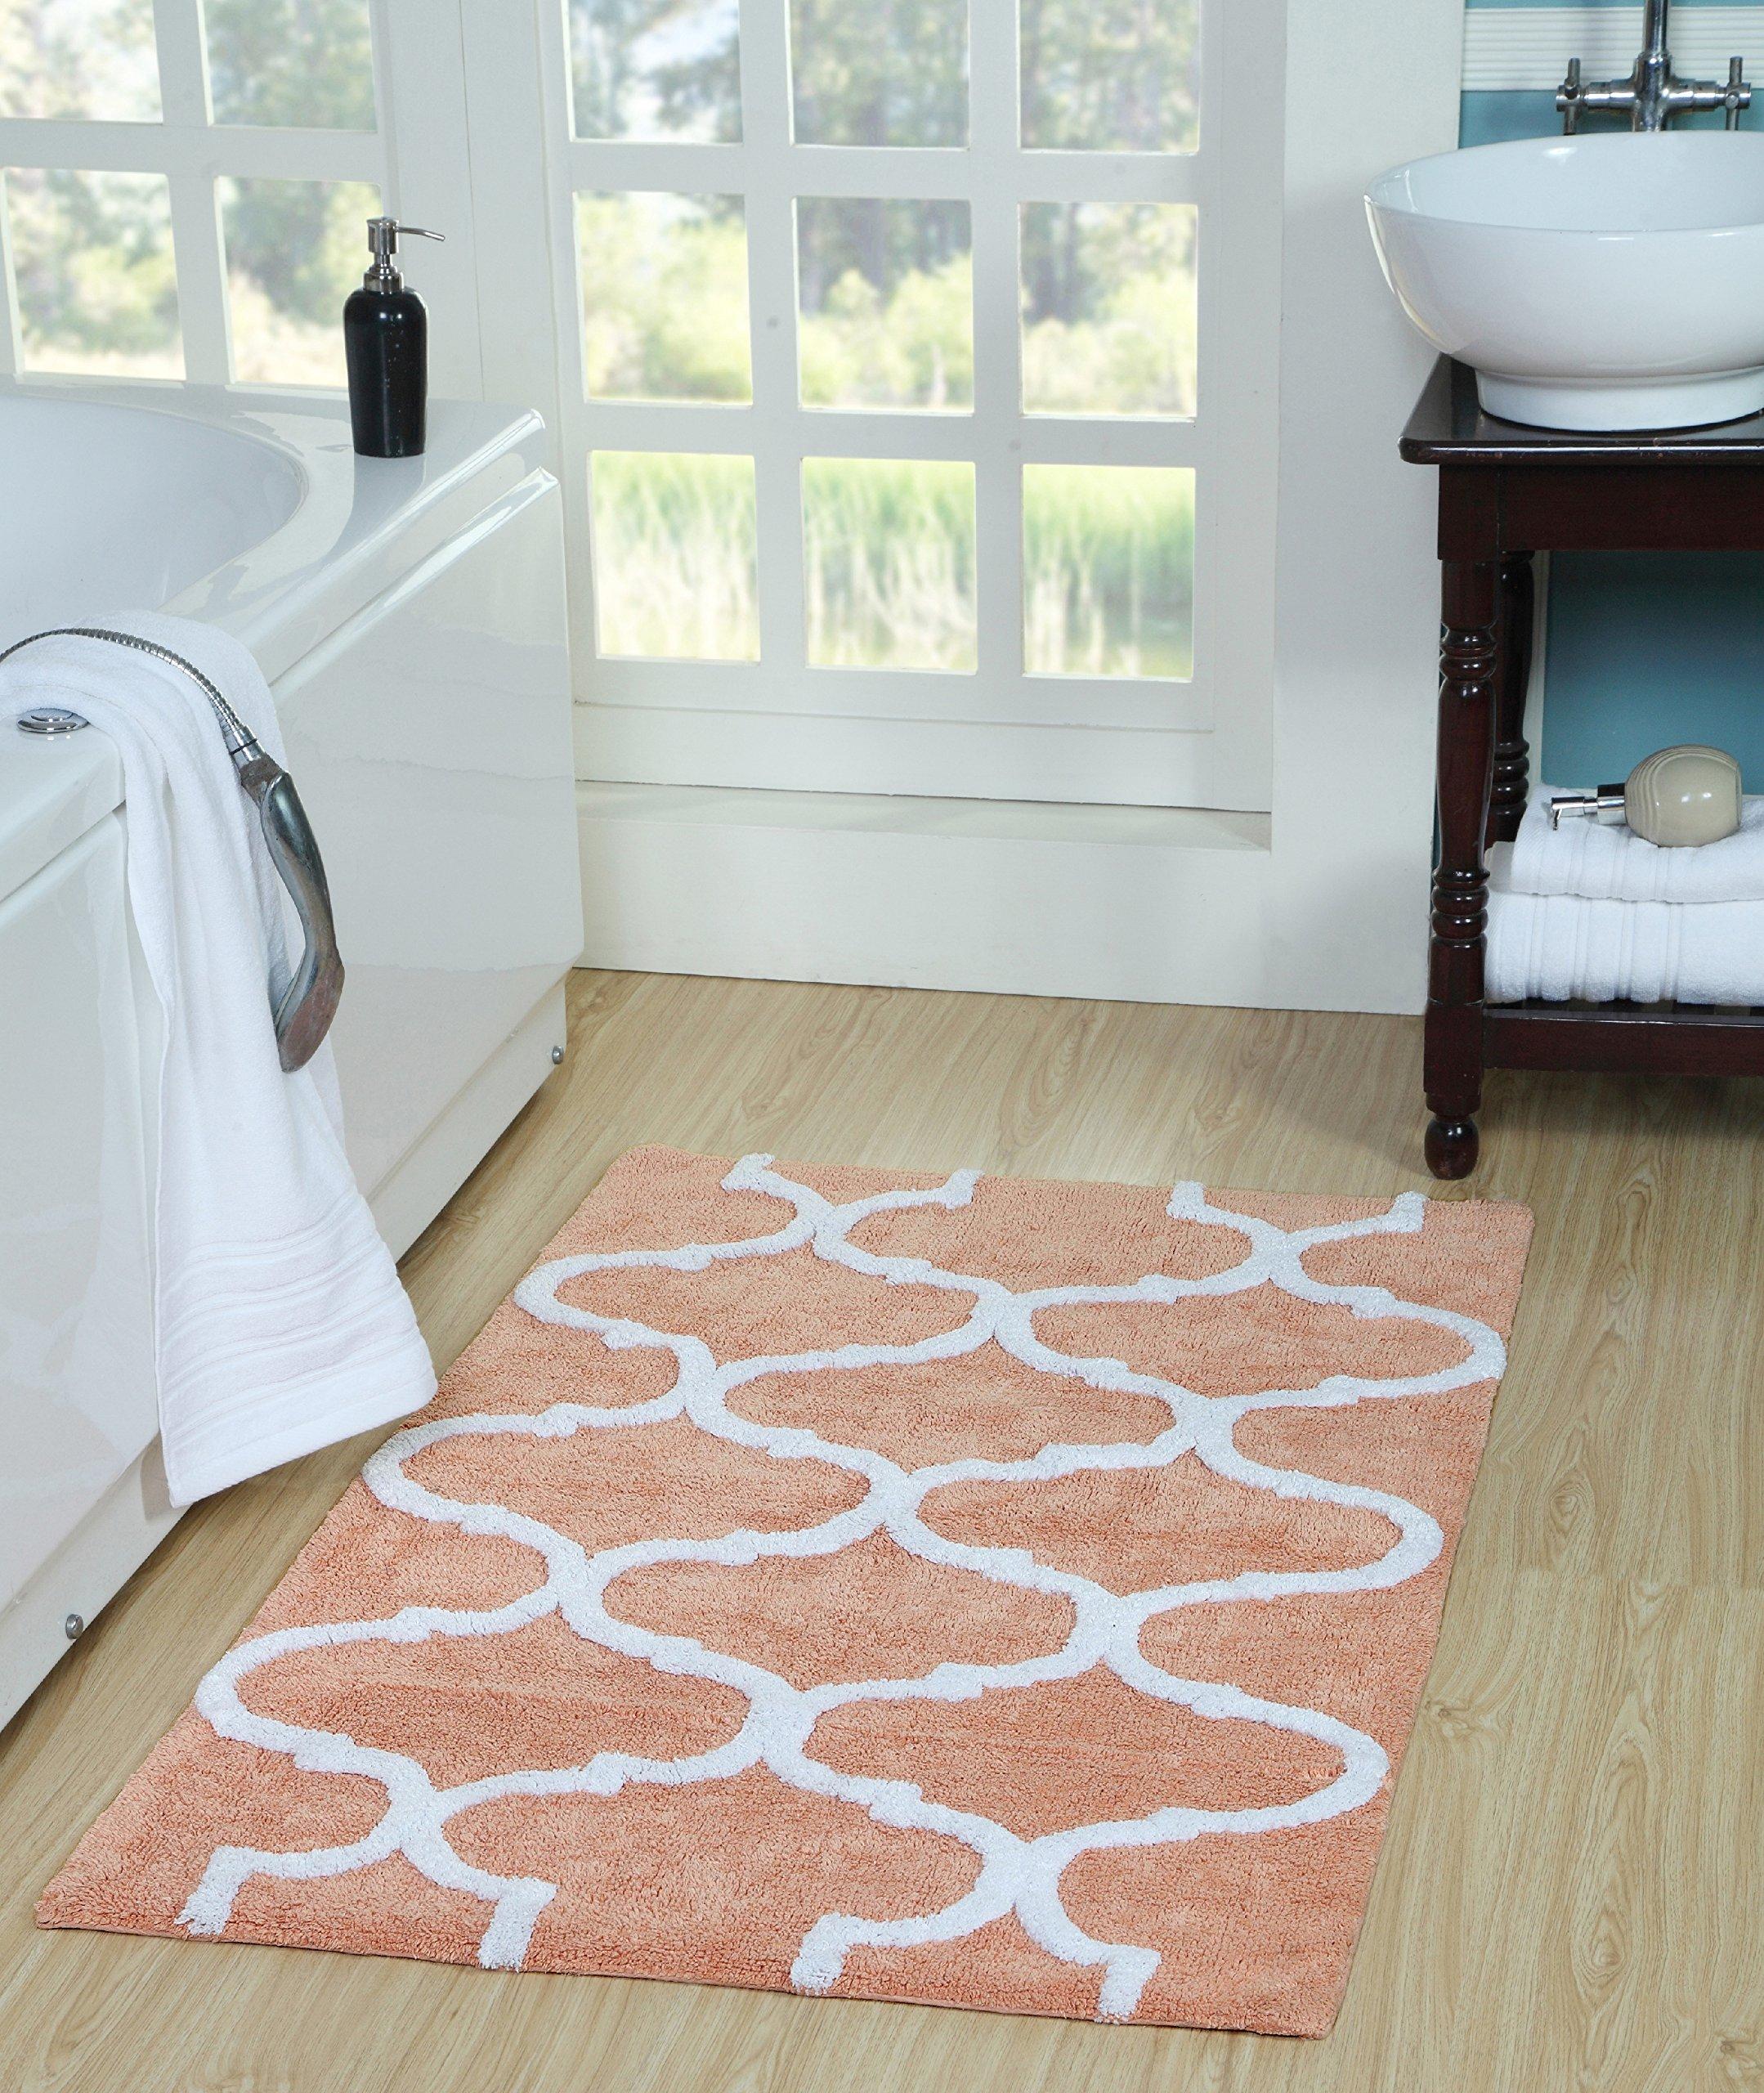 Saffron Fabs Geometric Bath Rug Cotton, 50 50 Inch x 30 ...